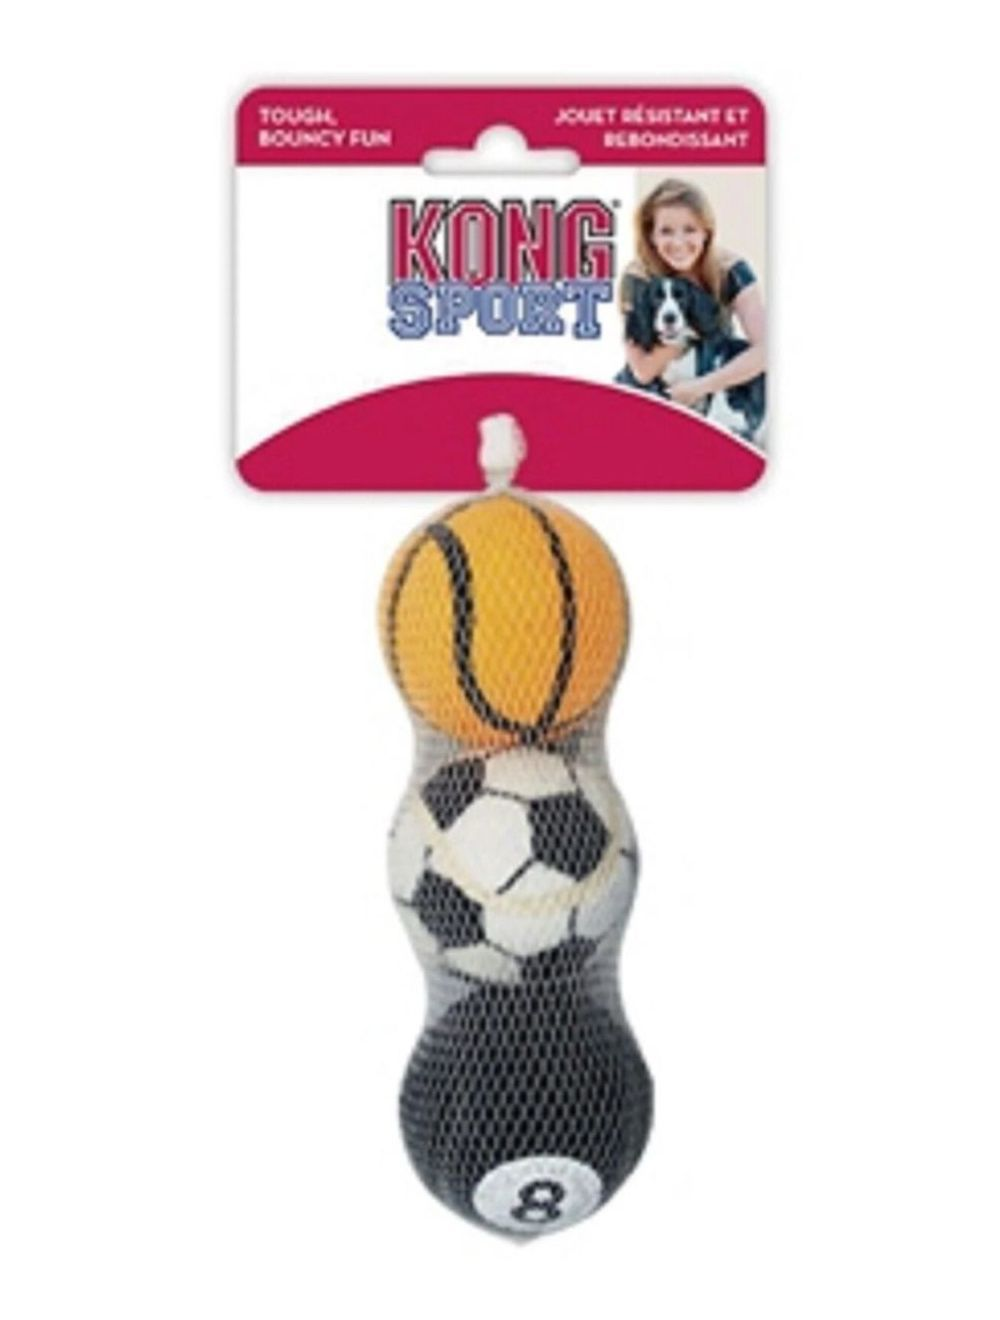 Juguete Kong sports balls pelota small x3 - Ciudaddemascotas.com